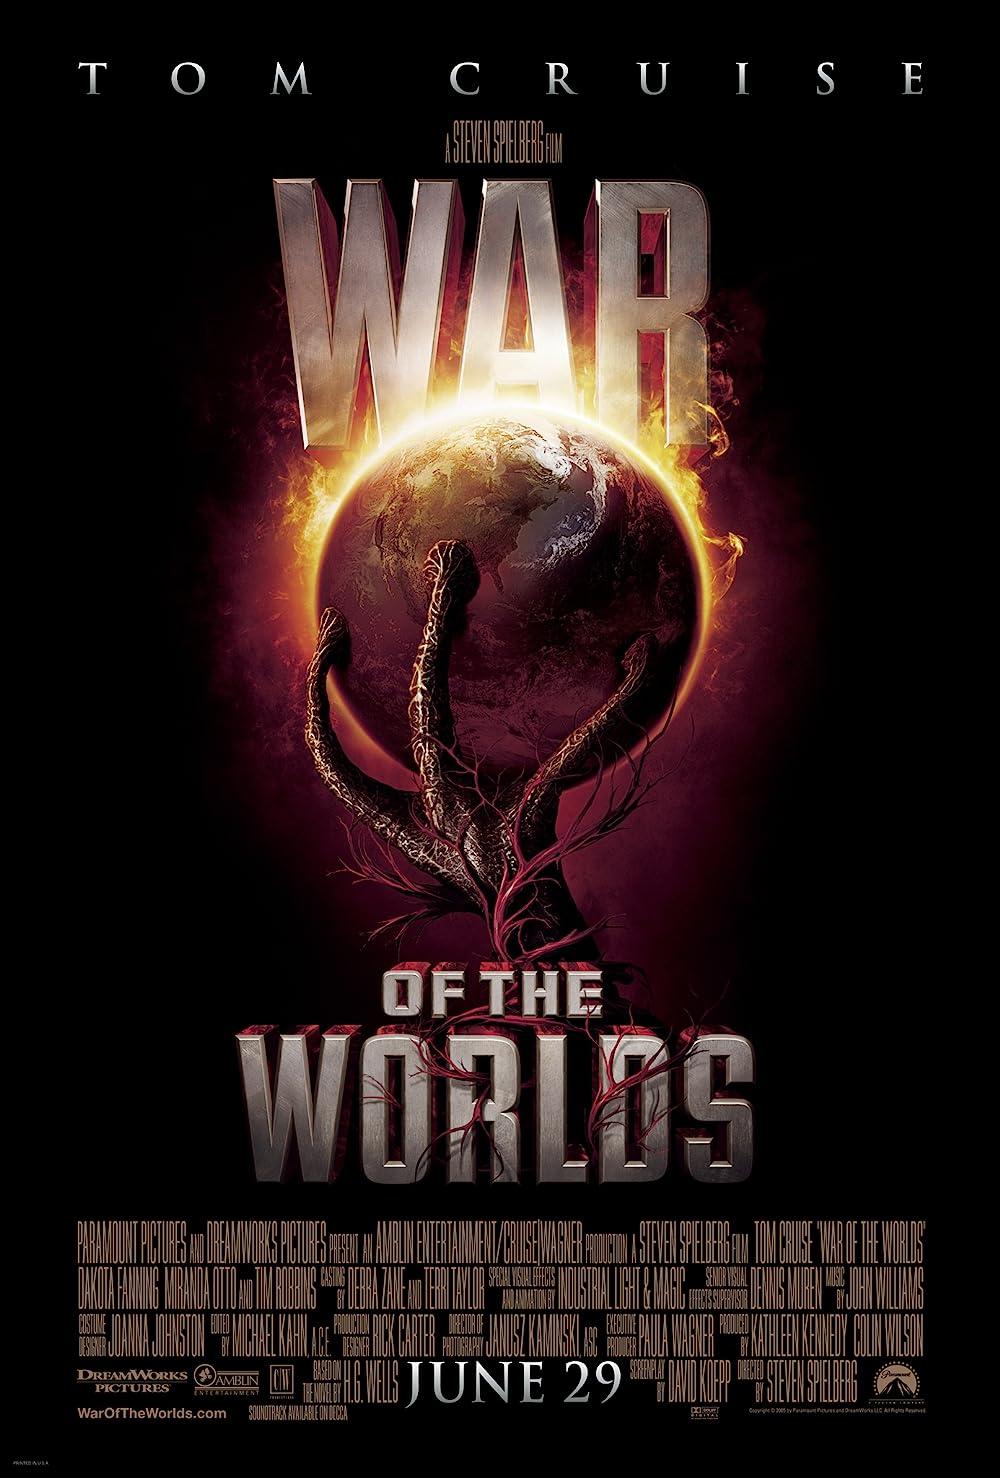 Krieg der Welten: Directed by Steven Spielberg. With Tom Cruise, Dakota Fanning, Miranda Otto, Justin Chatwin. An updated version of H.G Wells